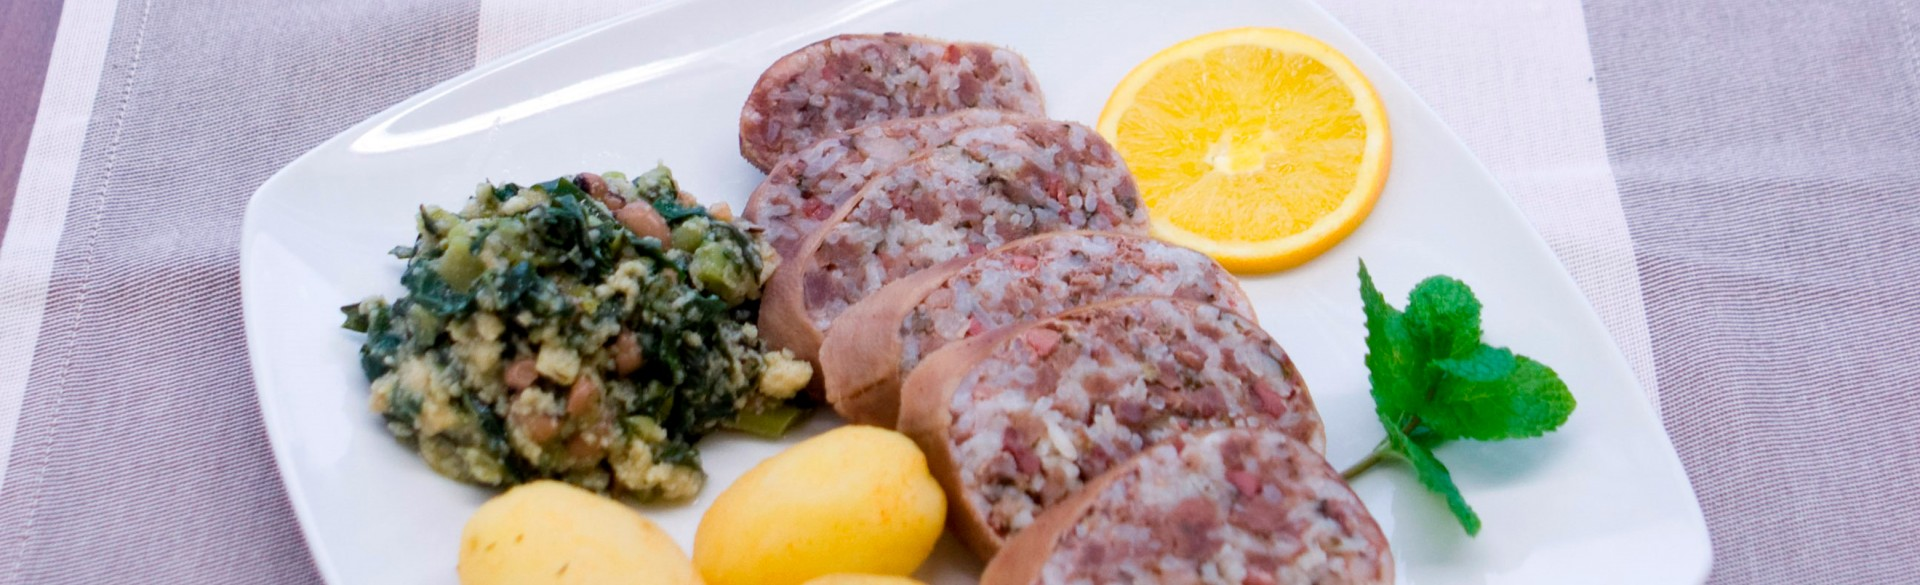 Maranhos (stuffed goat sausages)